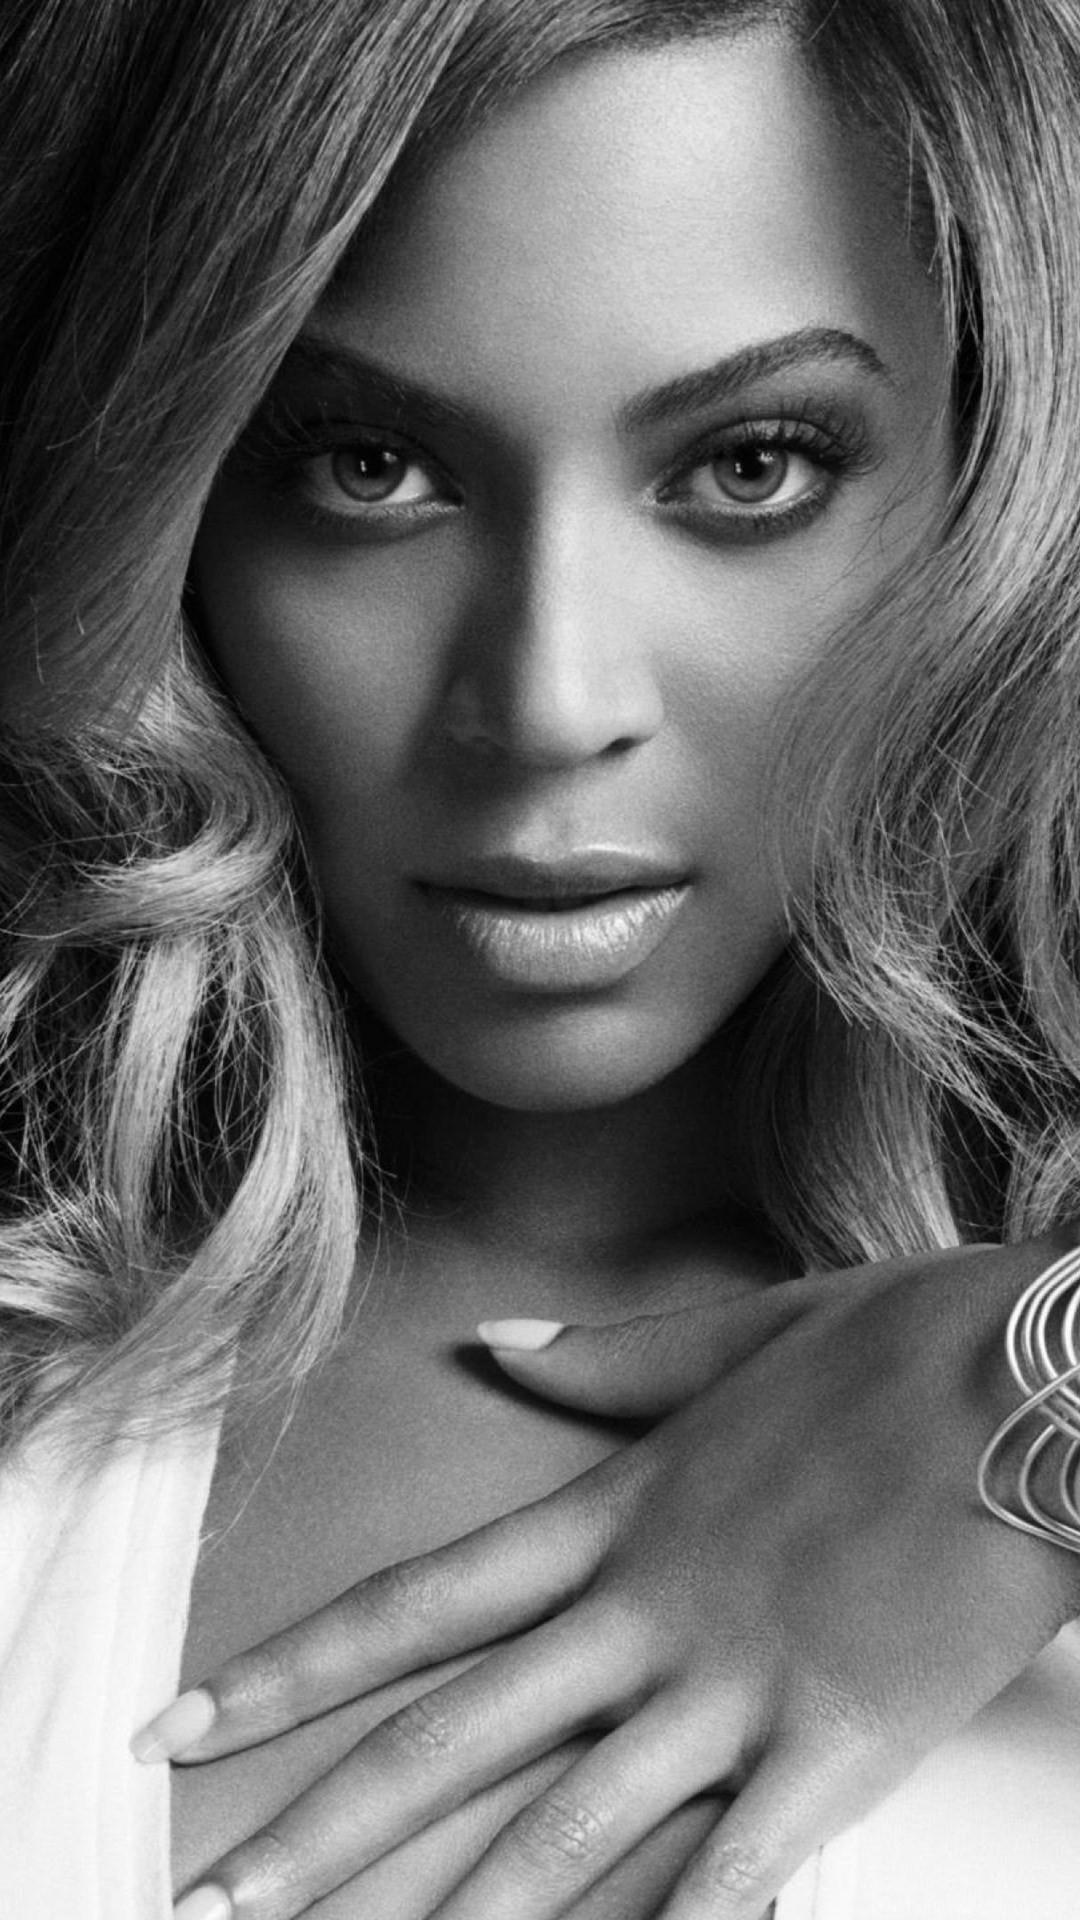 Beyonce iPhone 5 wallpaper